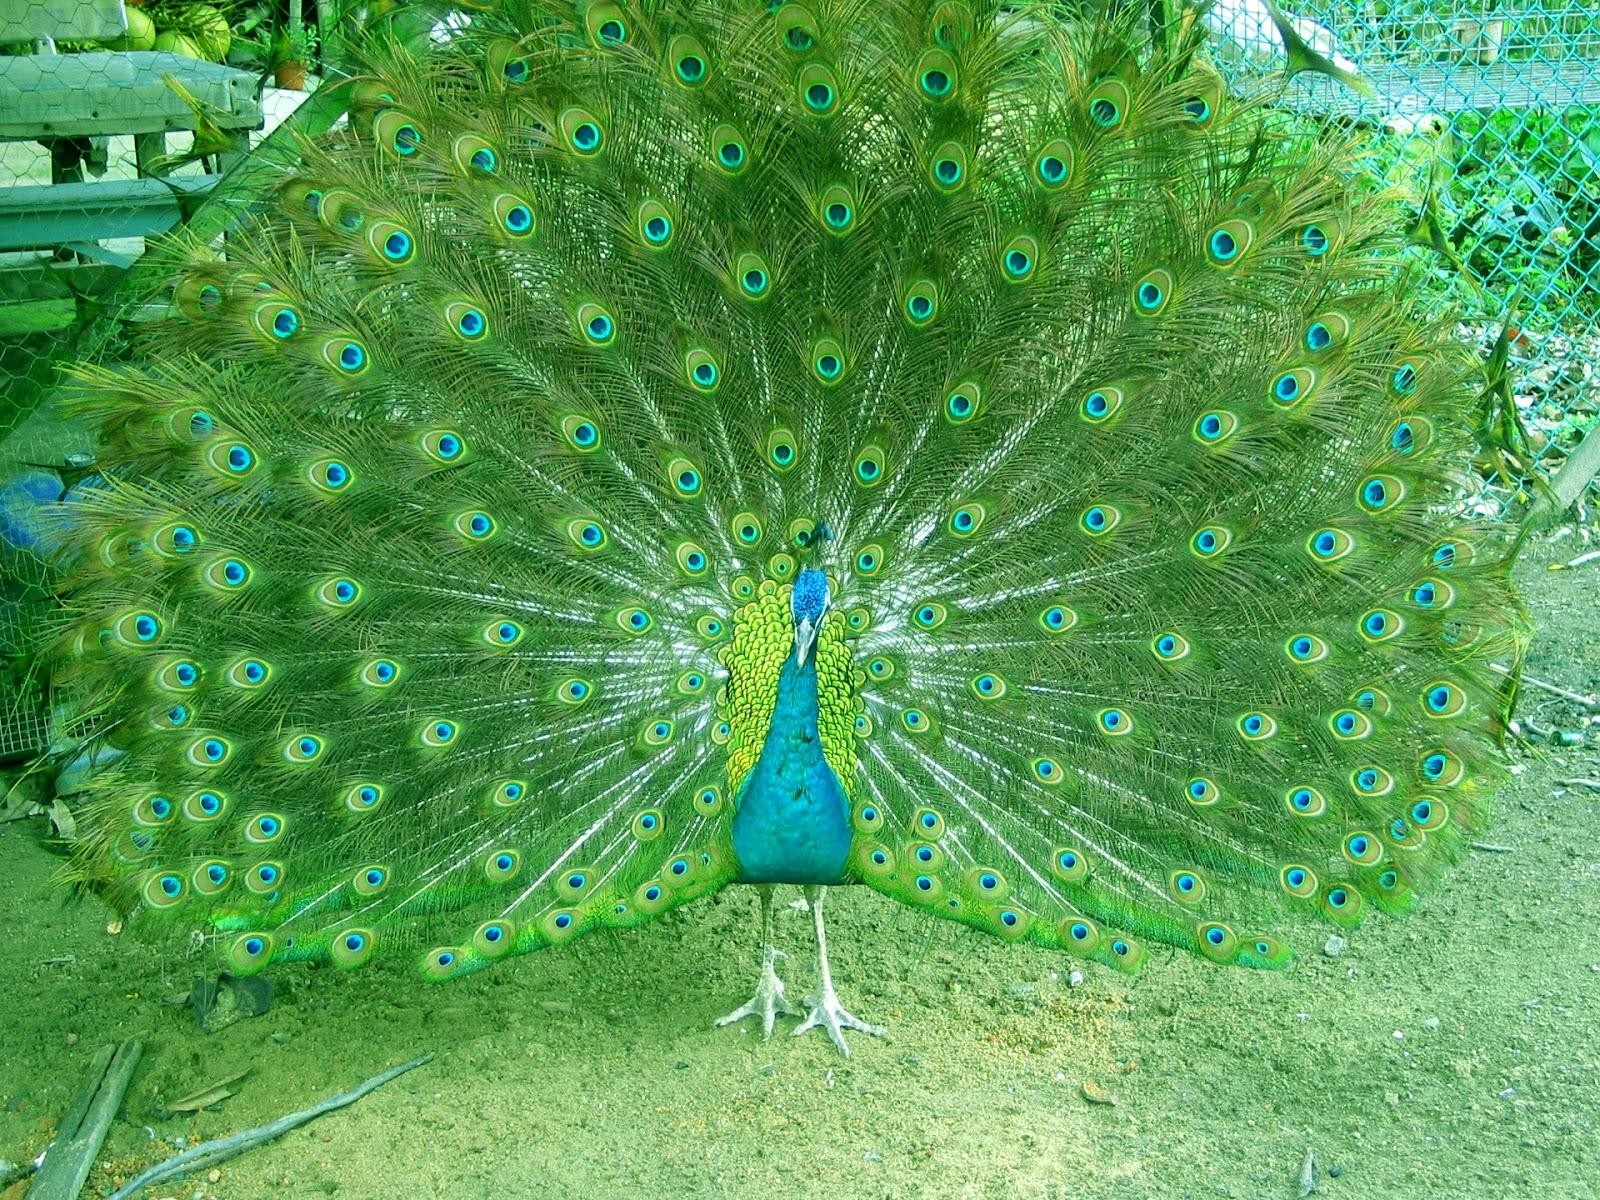 World Most Beautiful Bird Peacock Wallpapers SA 1600x1200